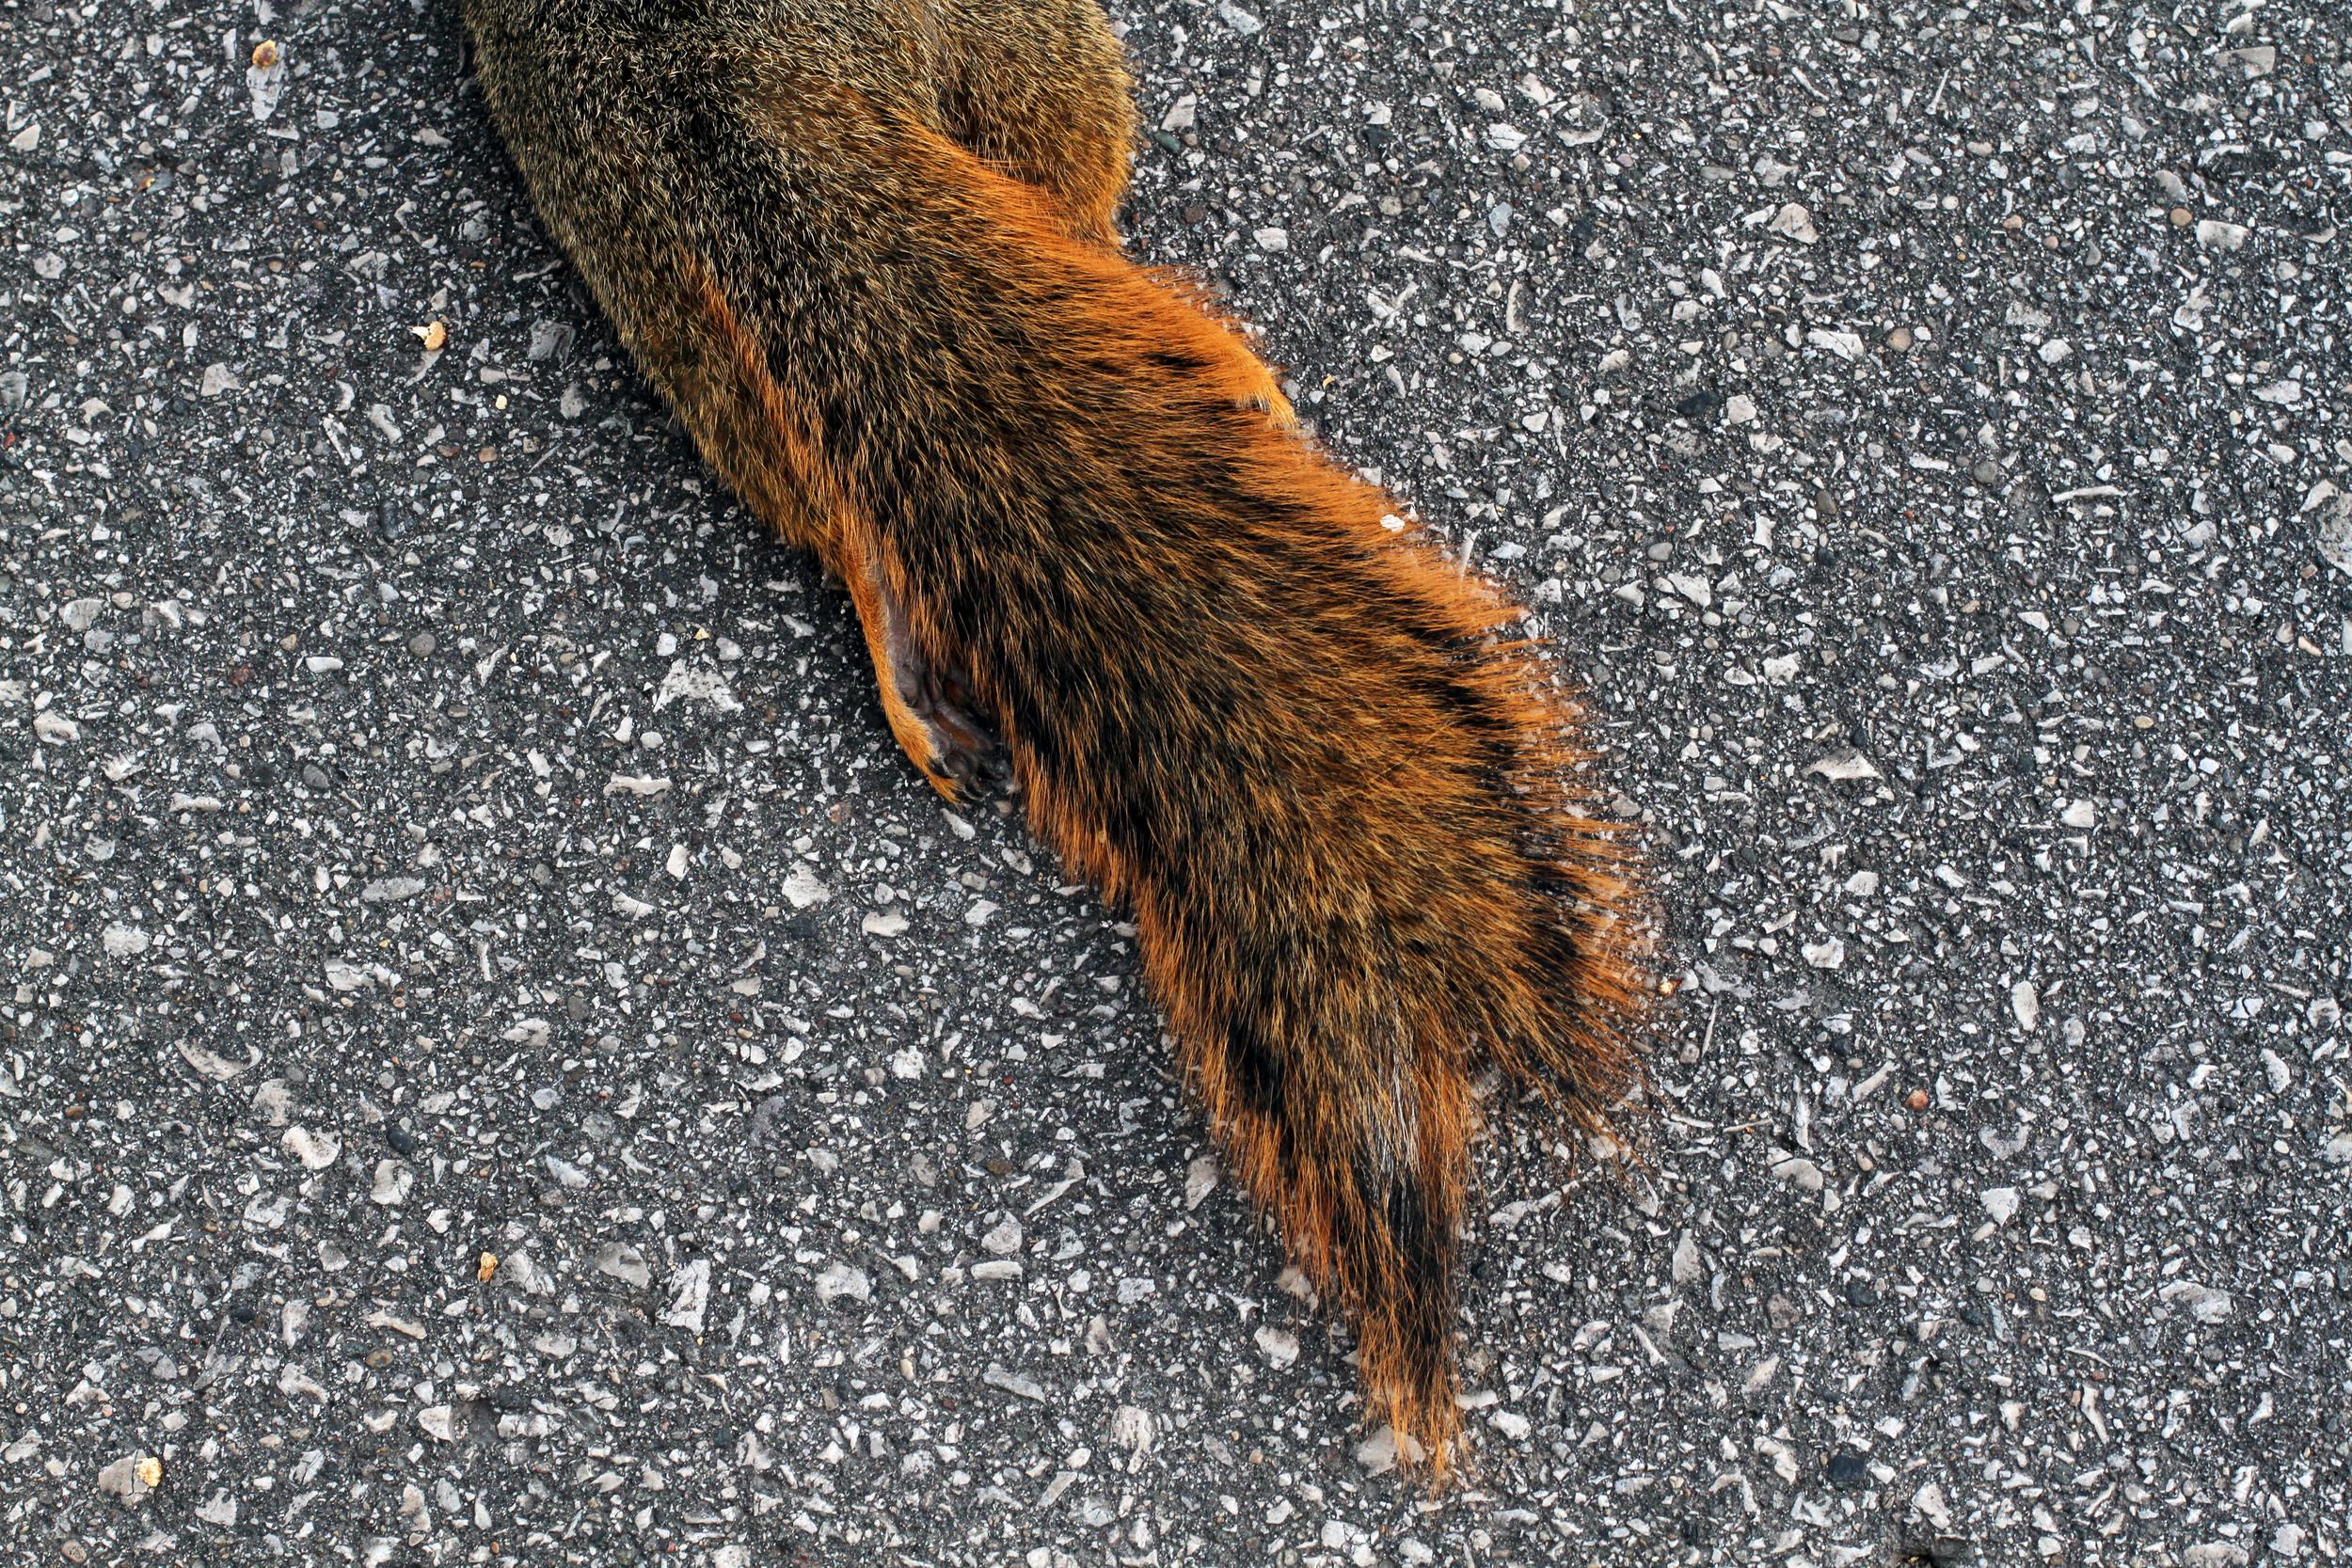 7squirrel.jpg